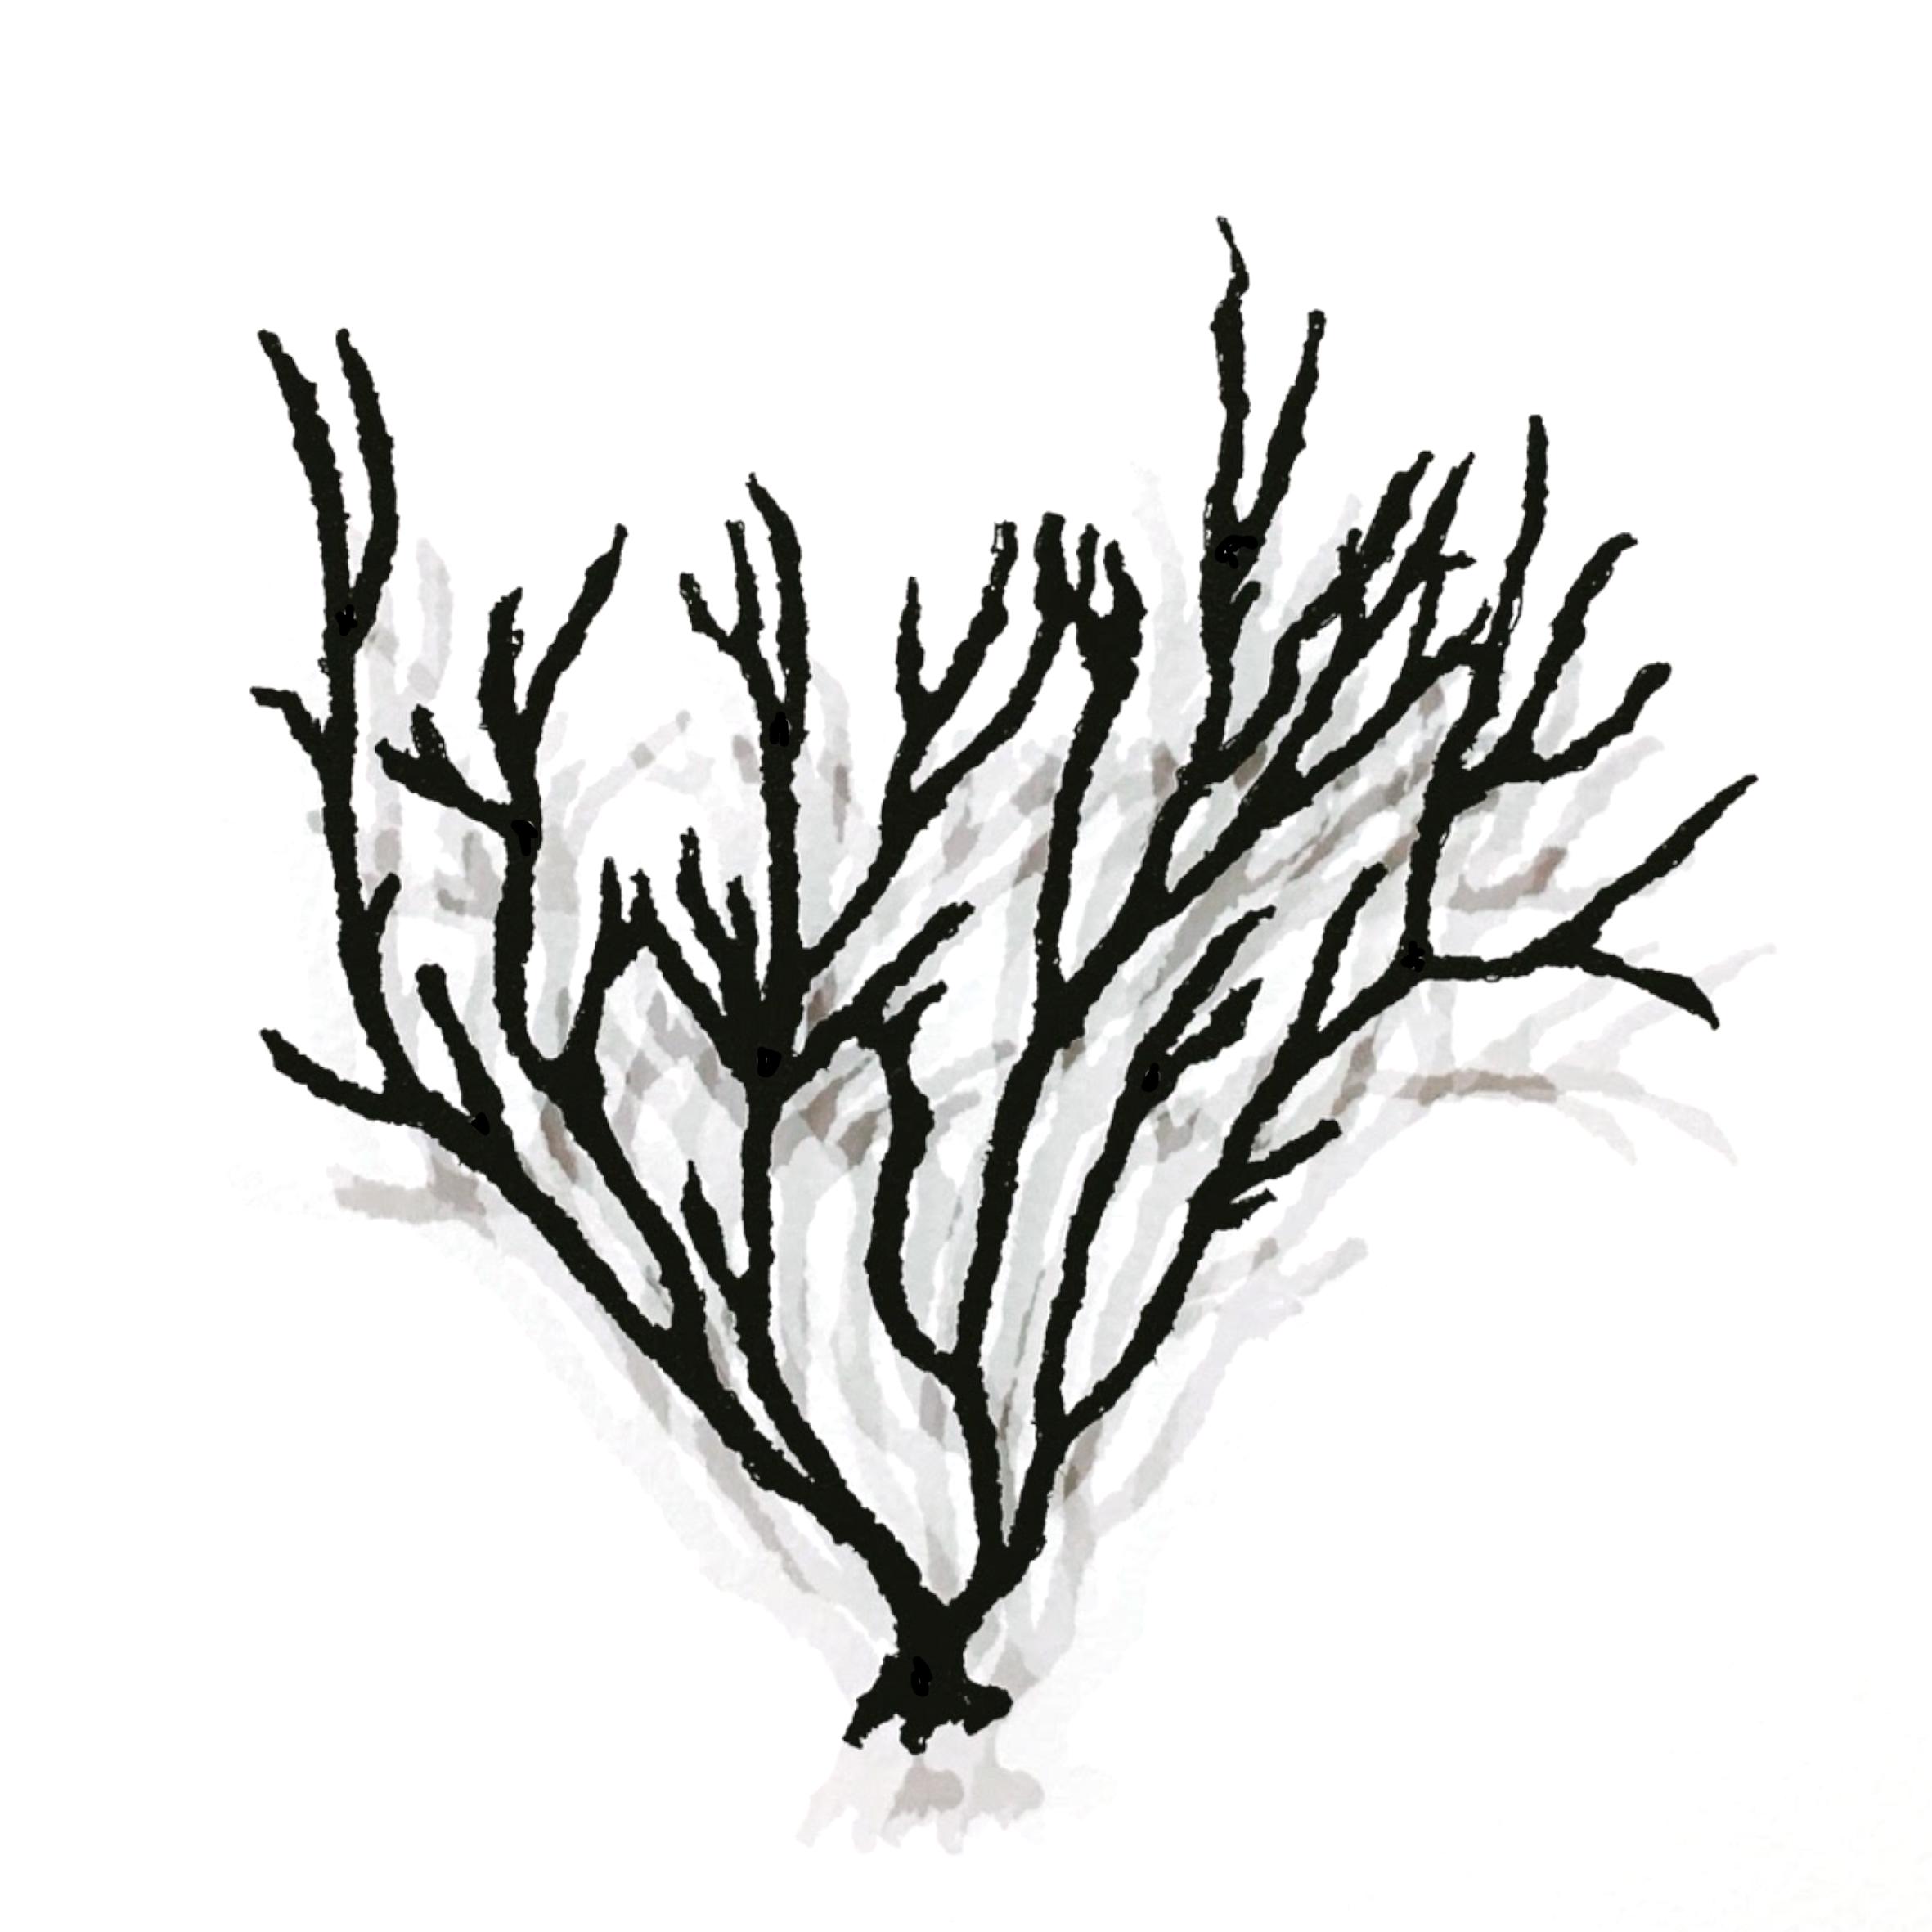 Seaweed #3